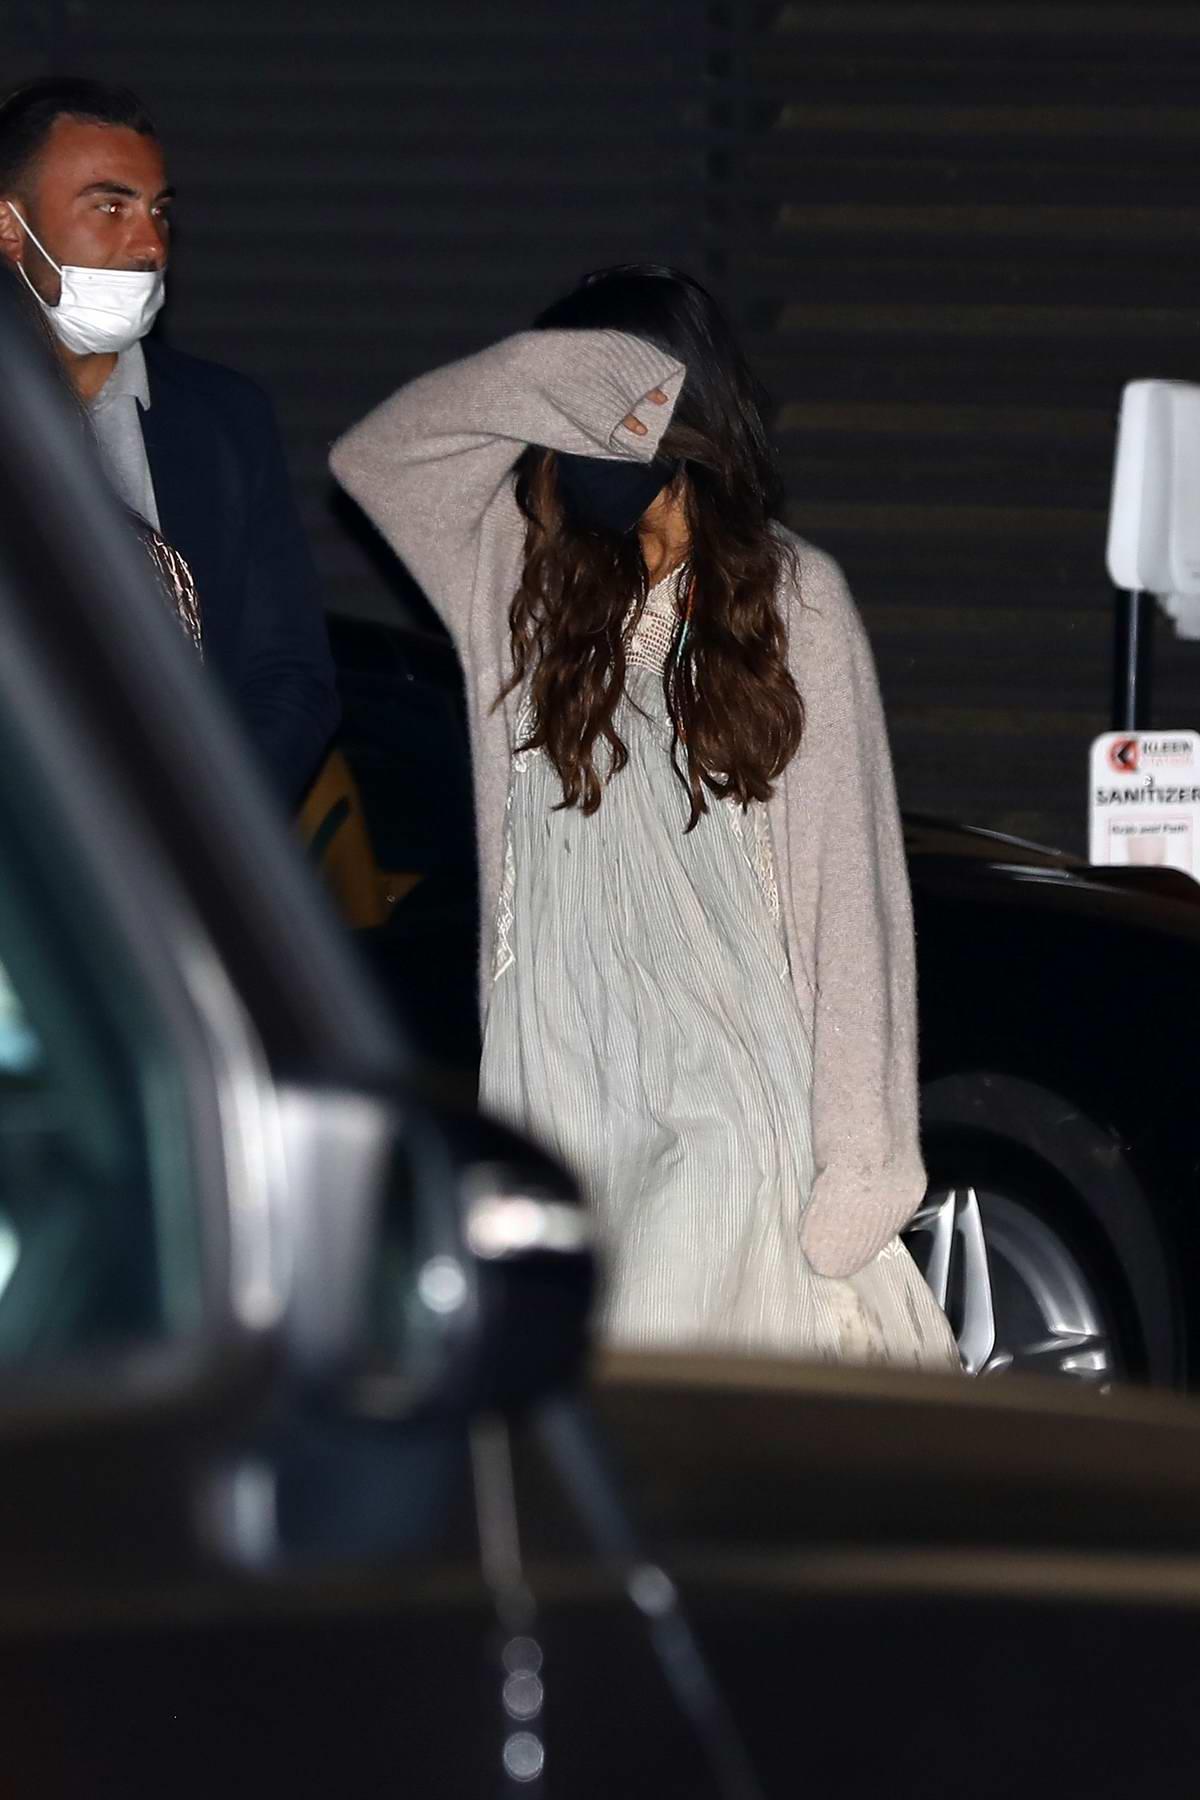 Selena Gomez walks behind a friend avoiding cameras after a dinner party at Nobu in Malibu, California